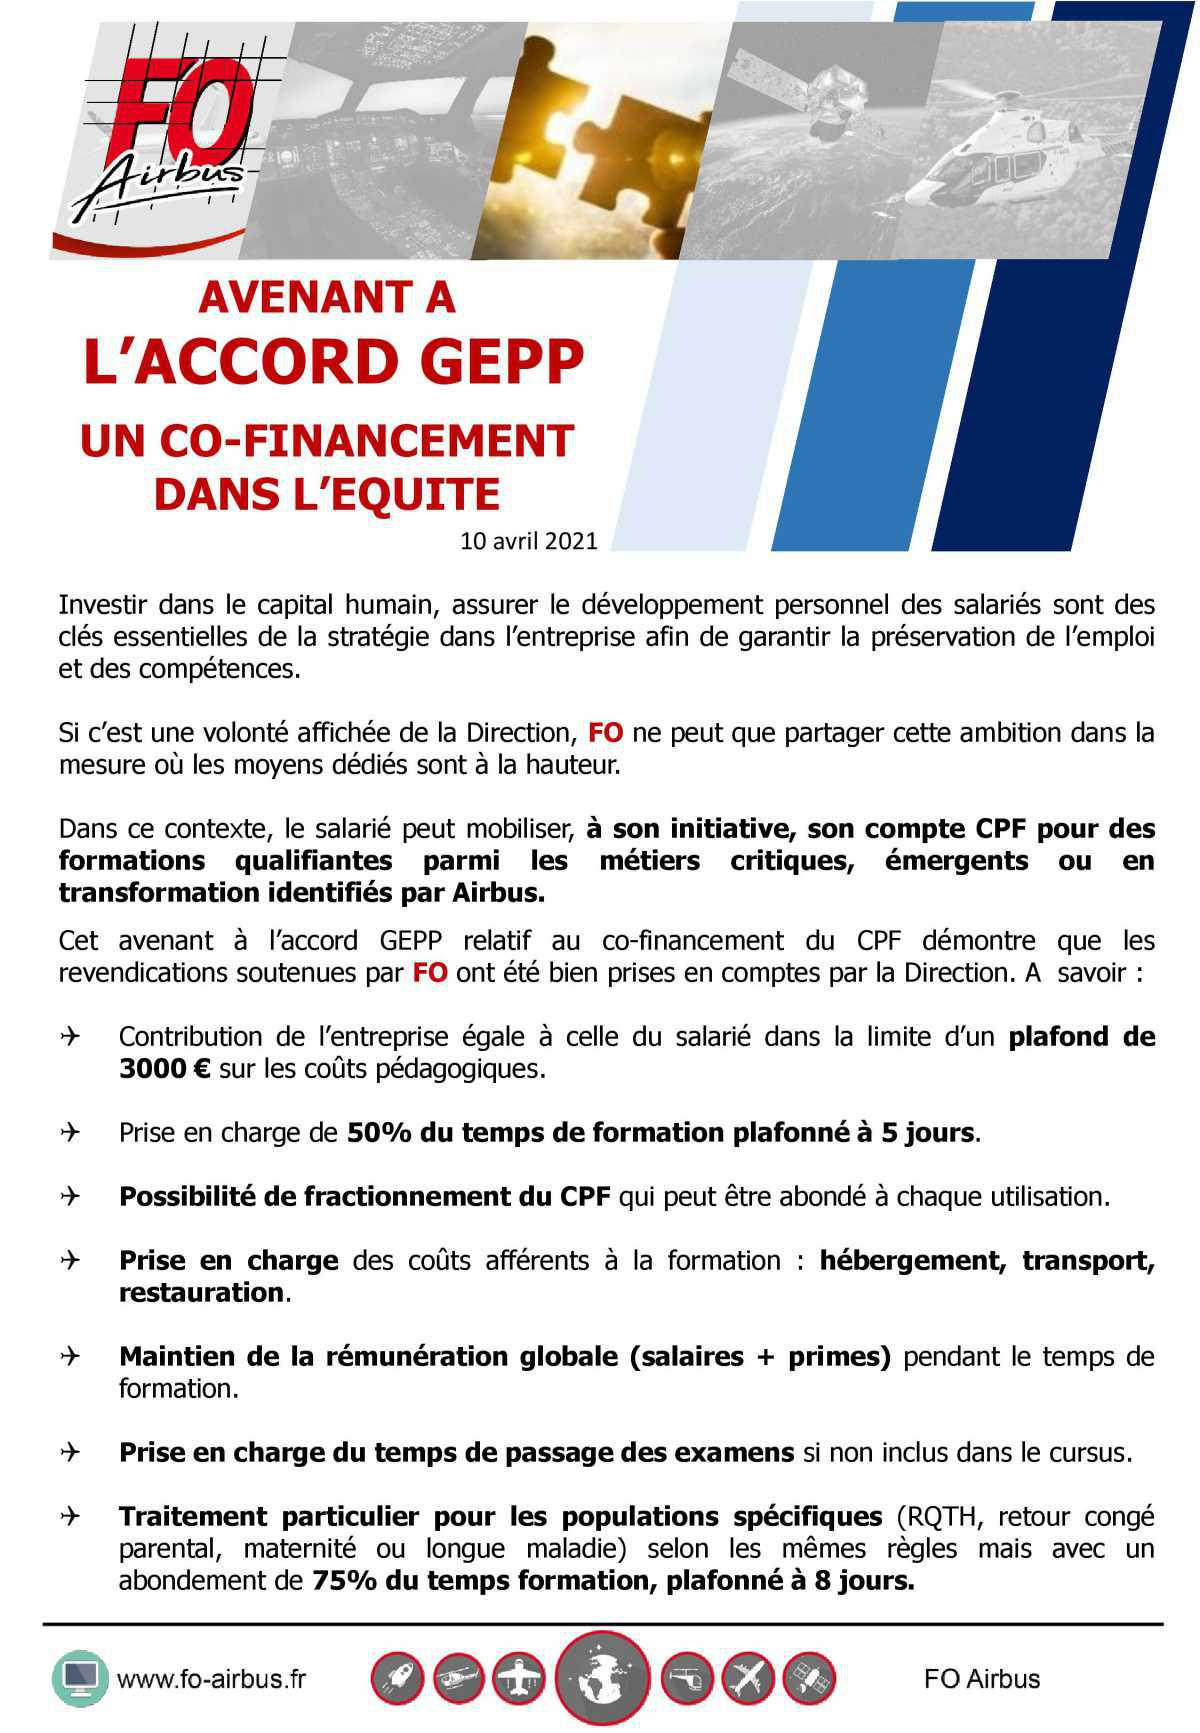 Avenant à l'accord GEPP : FO apposera sa signature